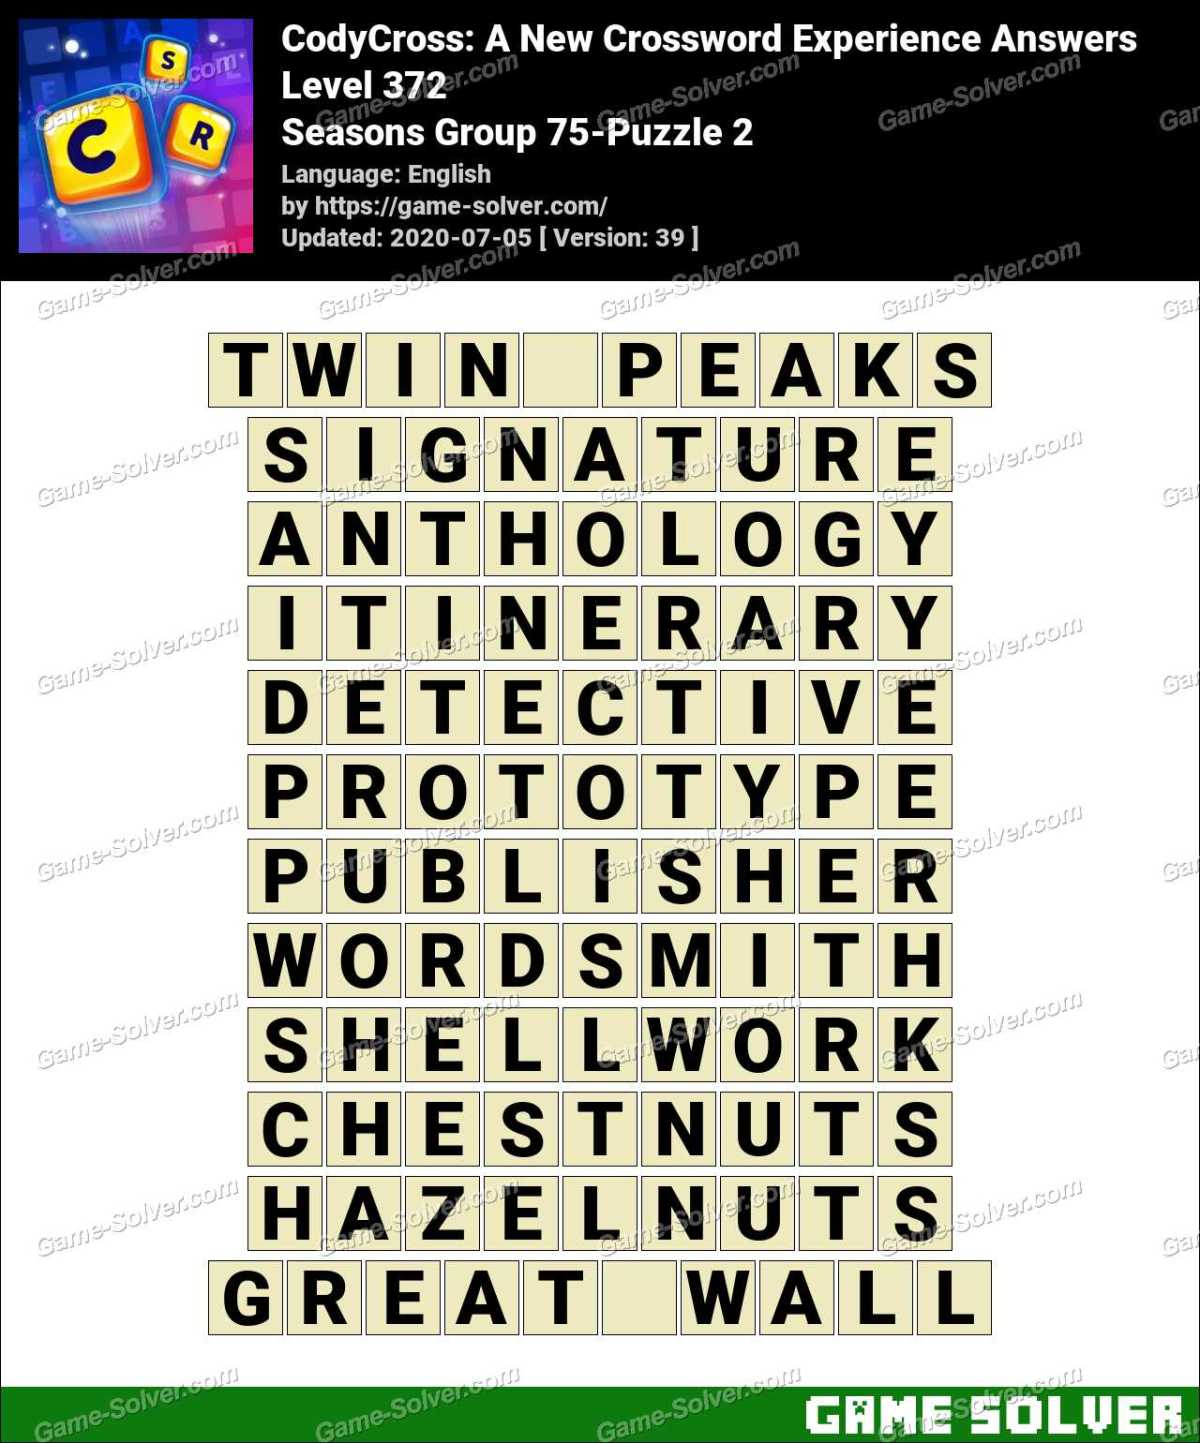 CodyCross Seasons Group 75-Puzzle 2 Answers